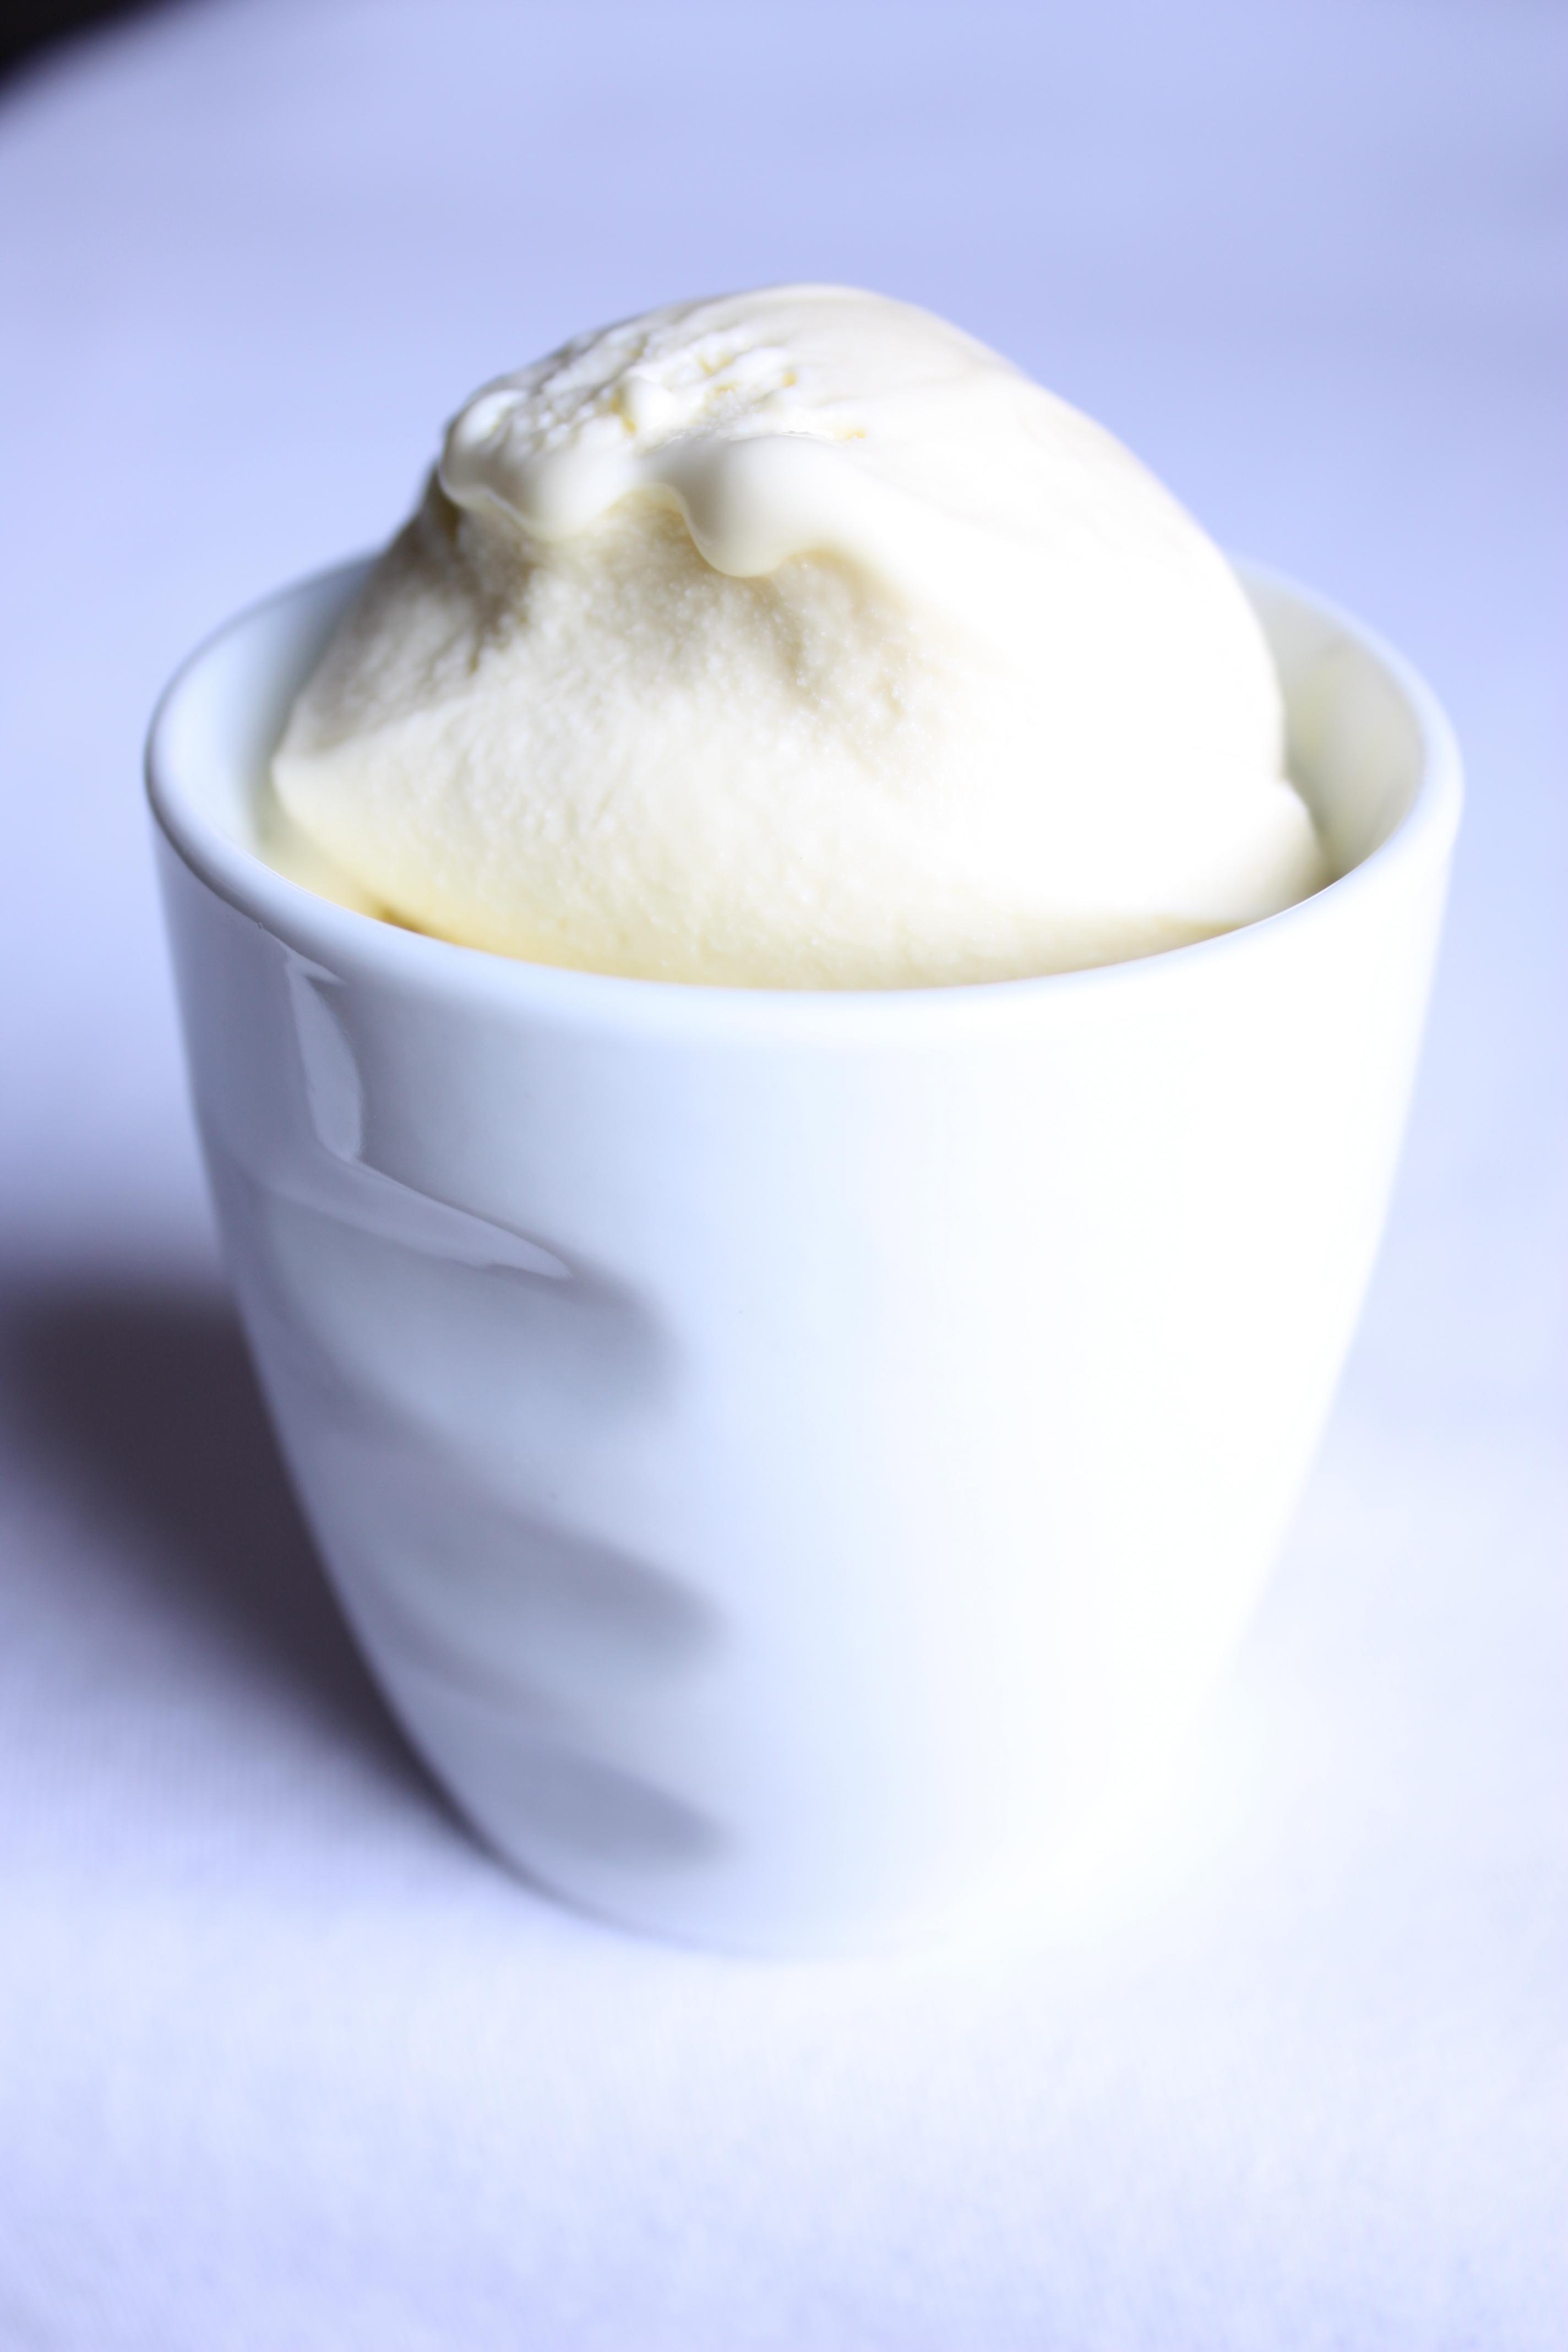 Meyer Lemon And Peppercorn Italian Ice Recipes — Dishmaps